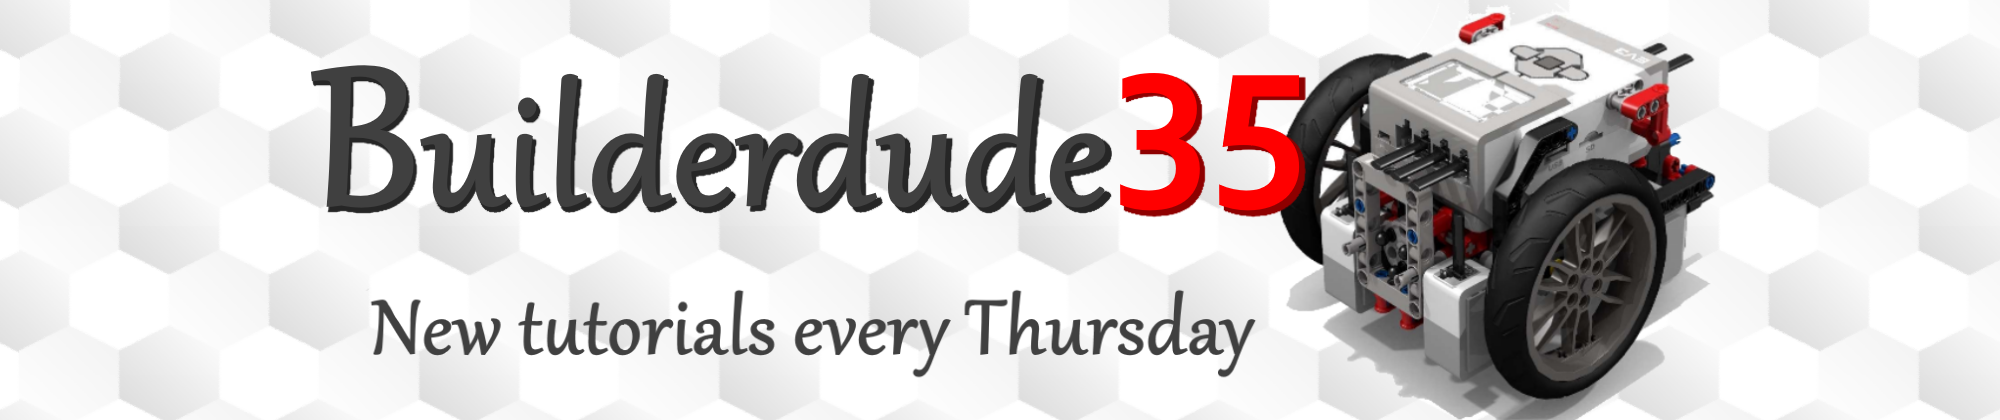 Builderdude35